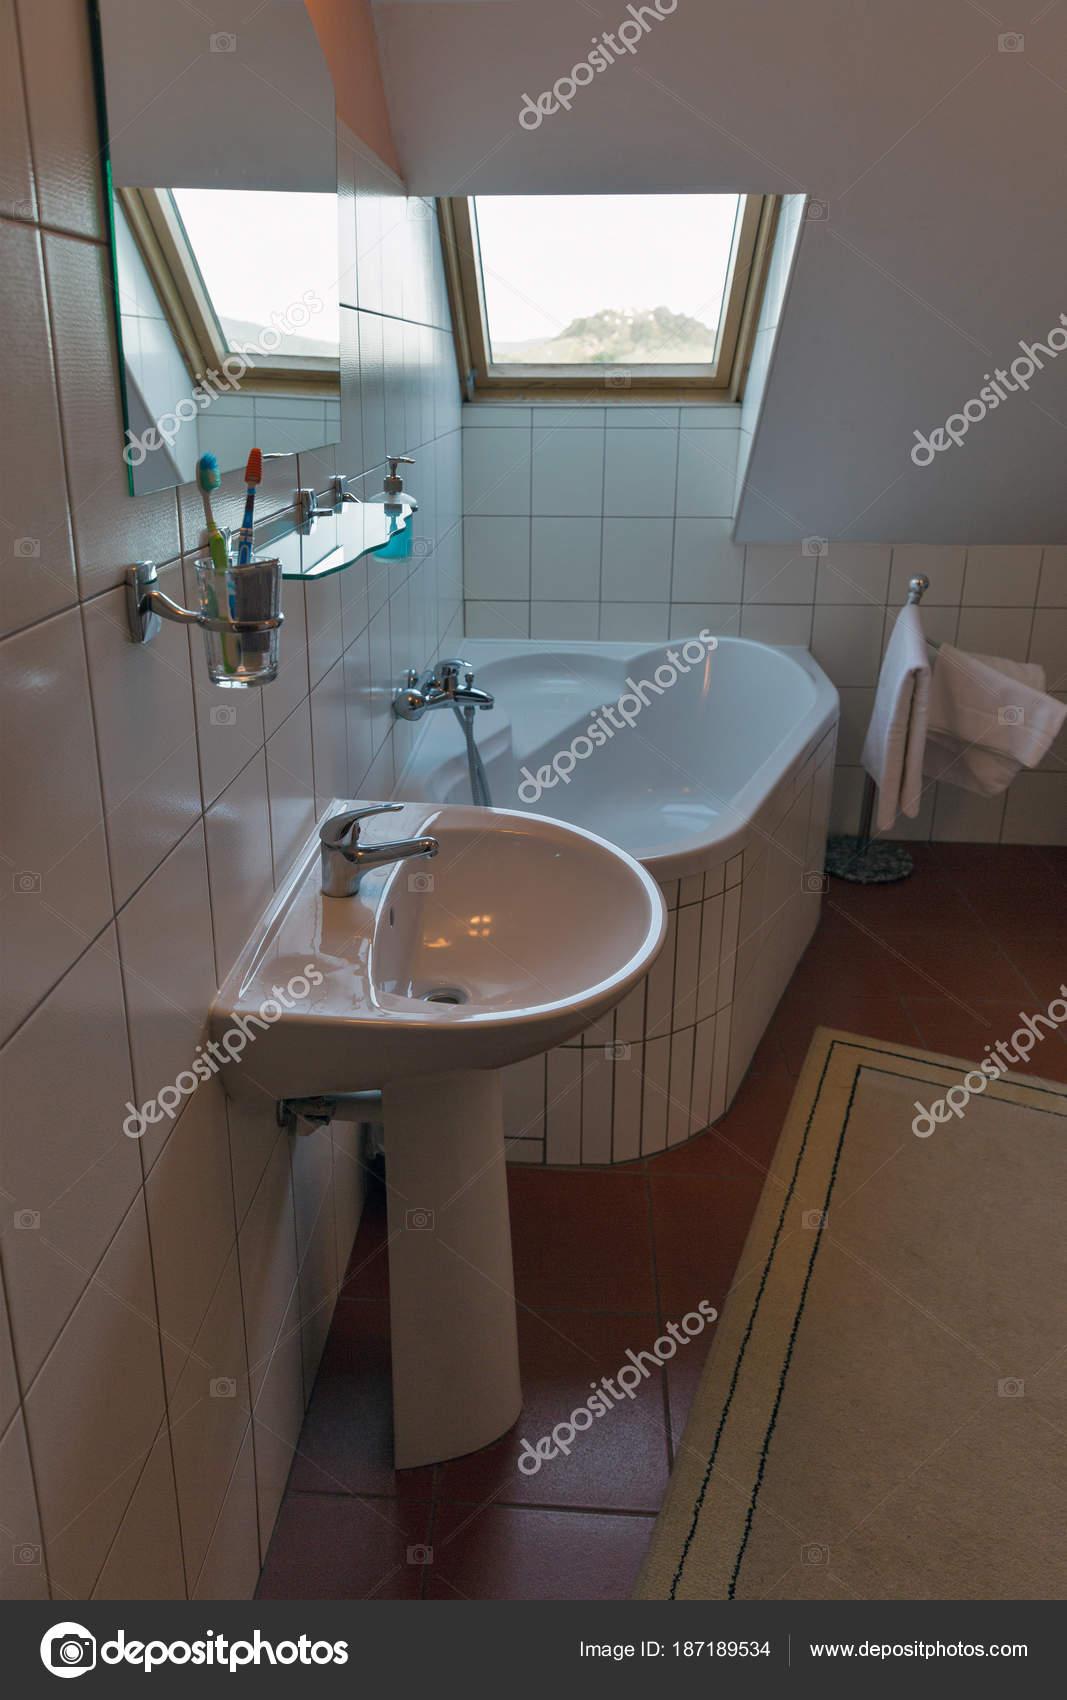 Moderne badkamer met hoekbad, lavabo en venster — Stockfoto ...